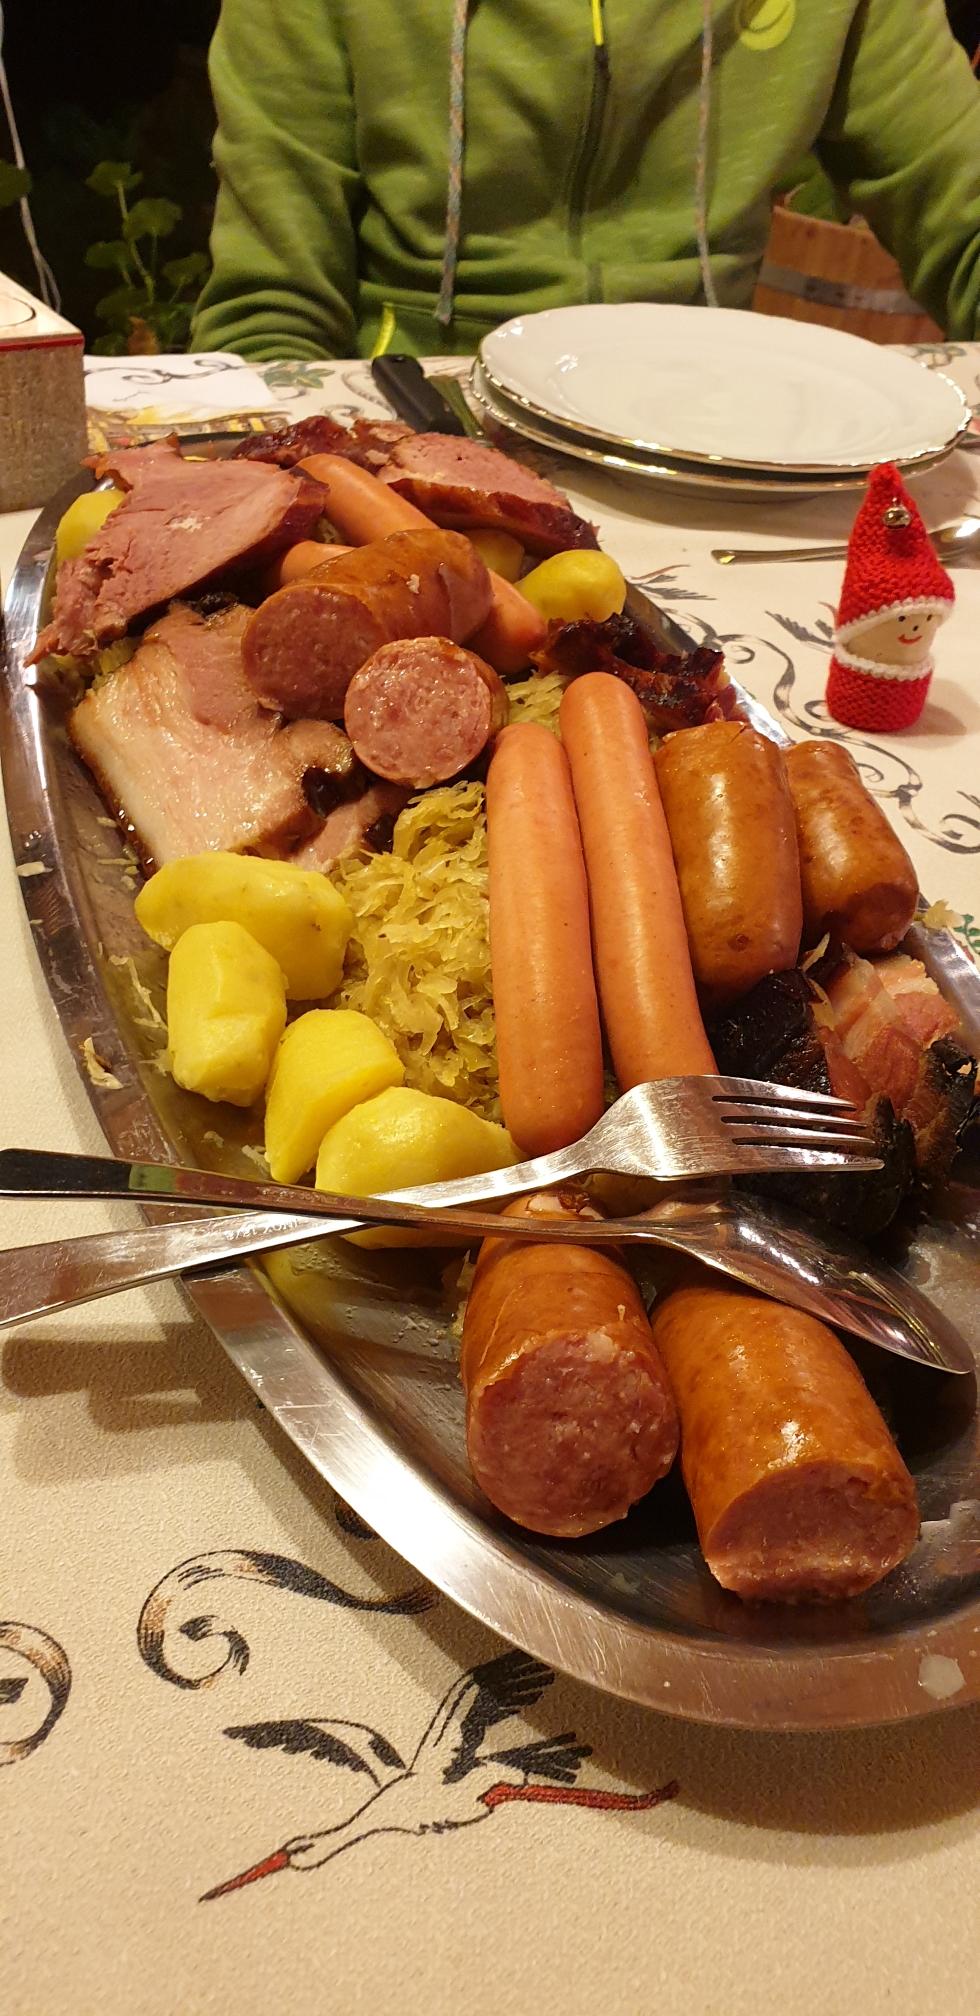 Hauptgang: Sauerkraut a la Ferme